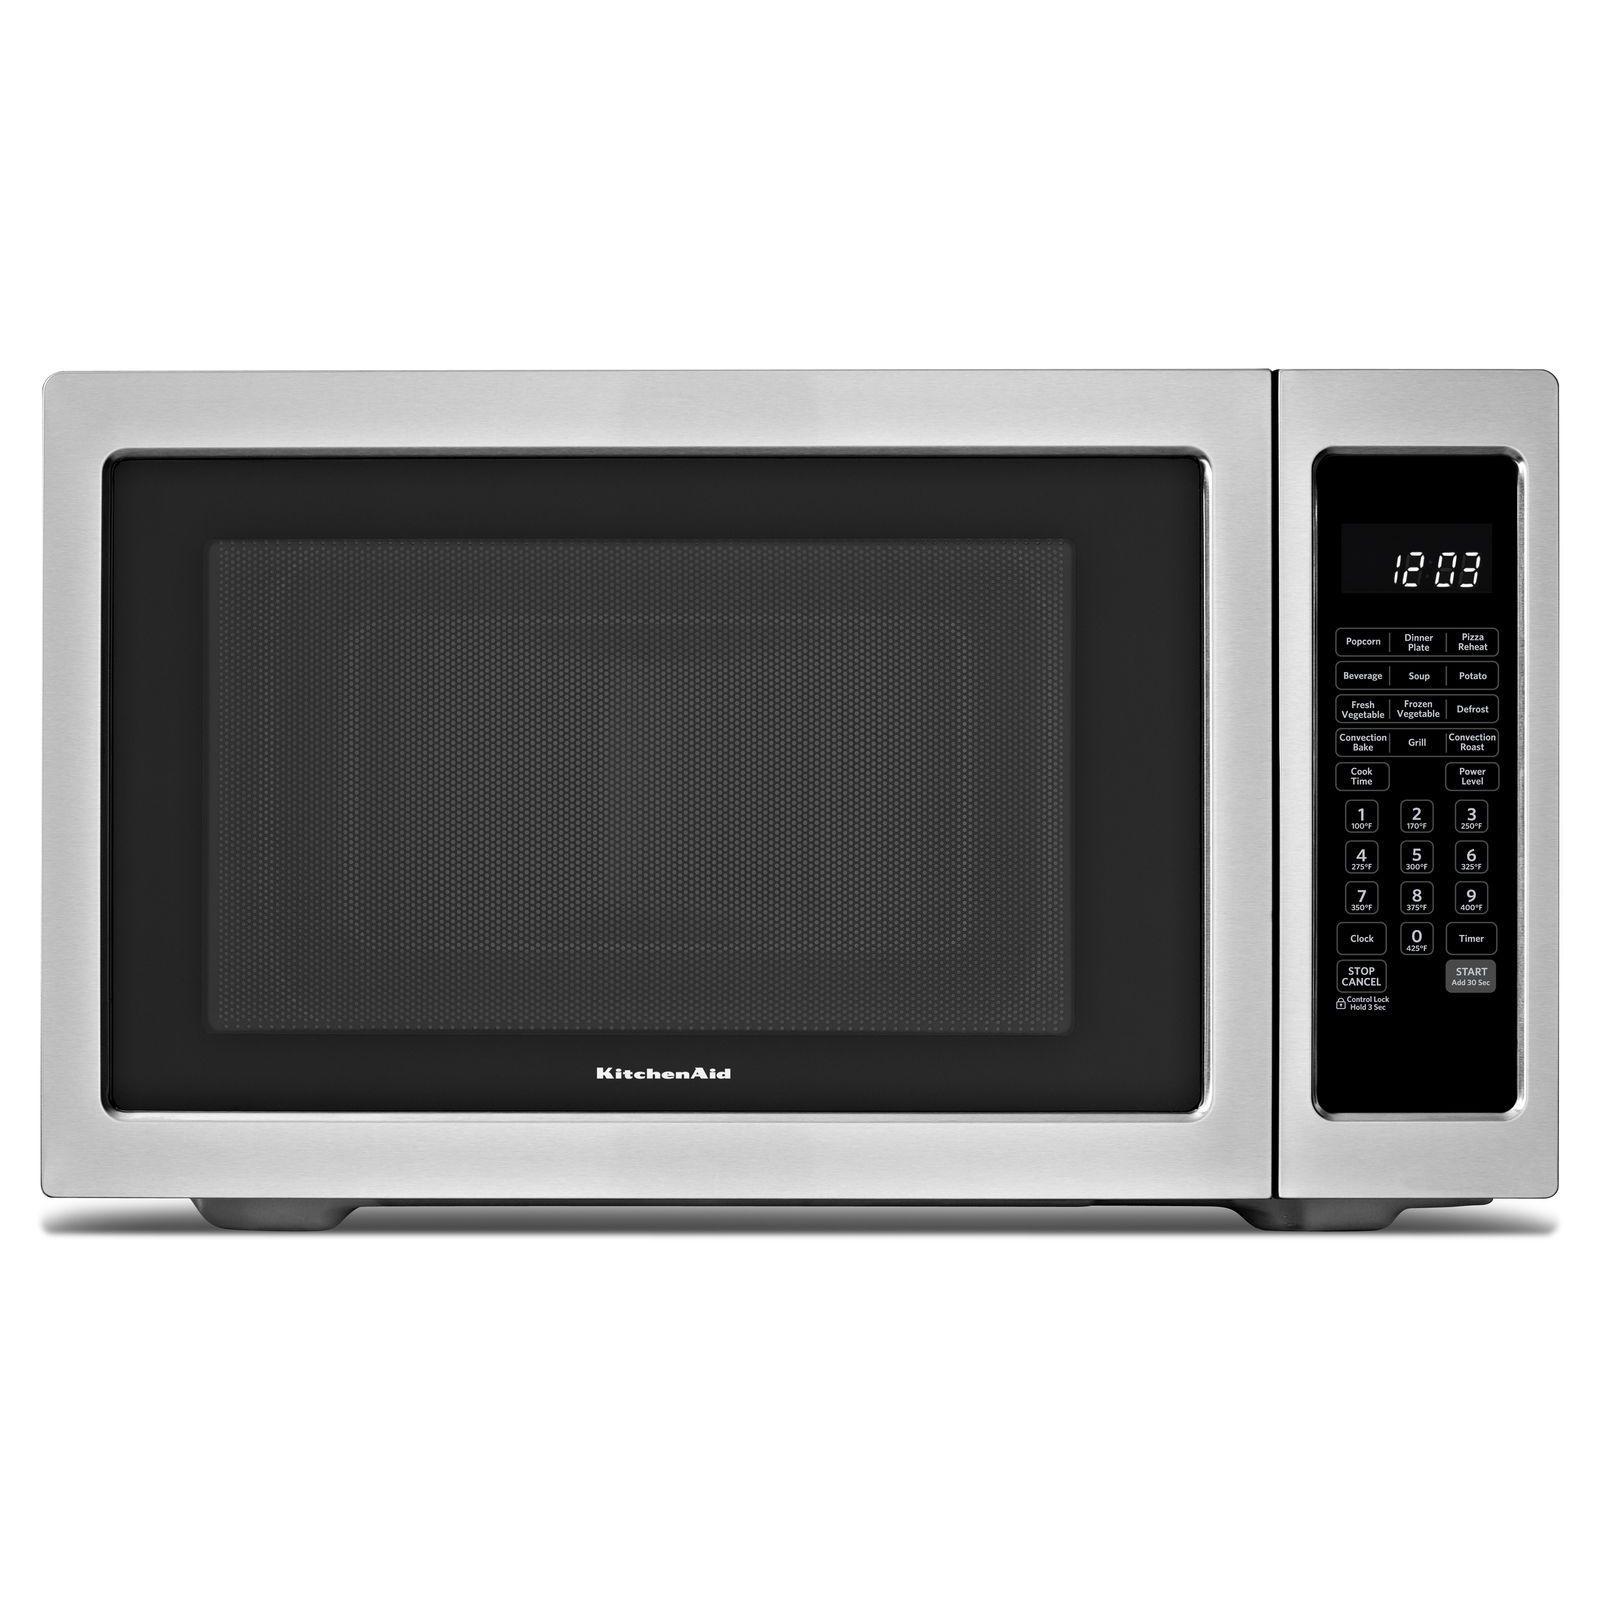 Kitchenaid 1200 Watt Countertop Convection Microwave Oven